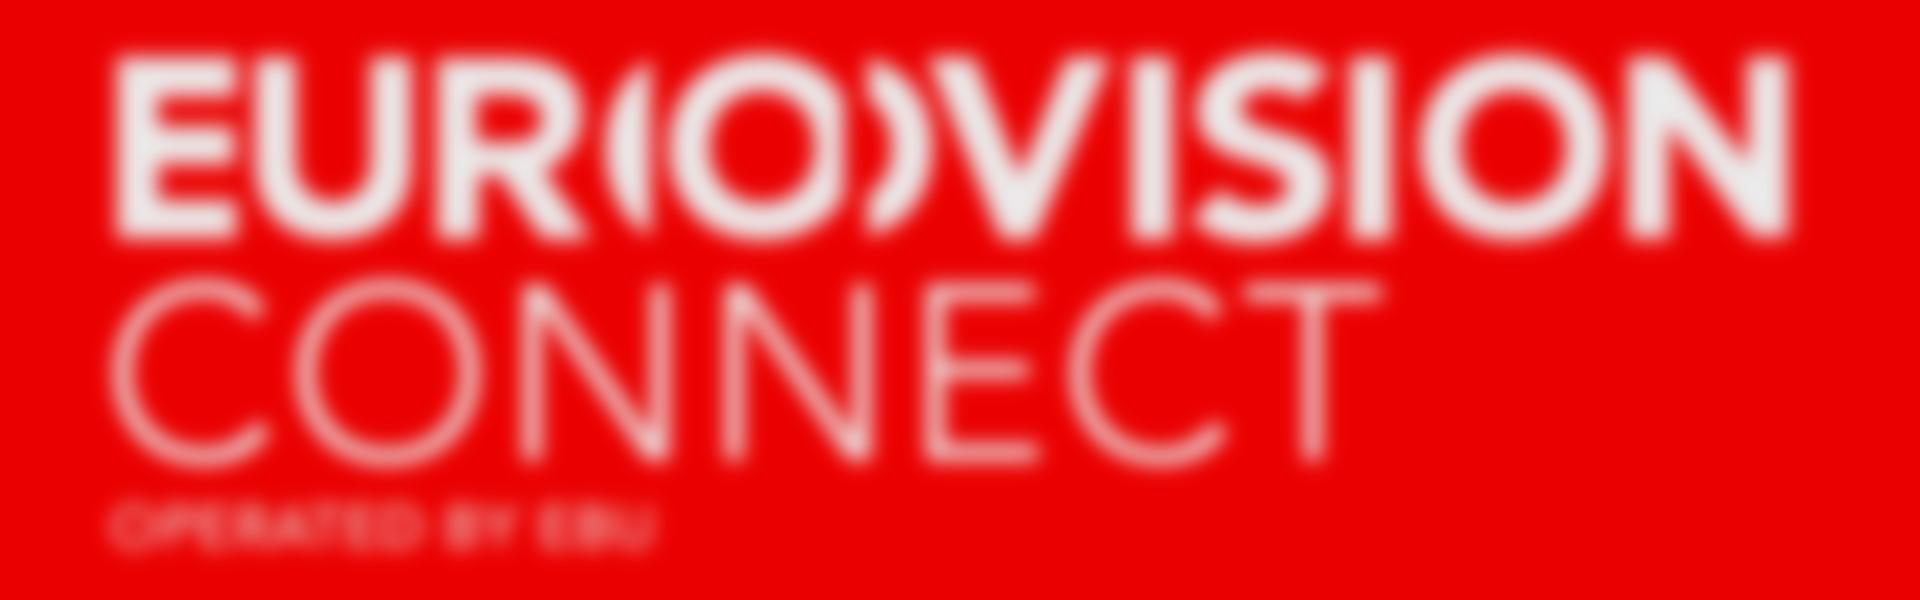 EUROVISION CONNECT, Prague 2016.